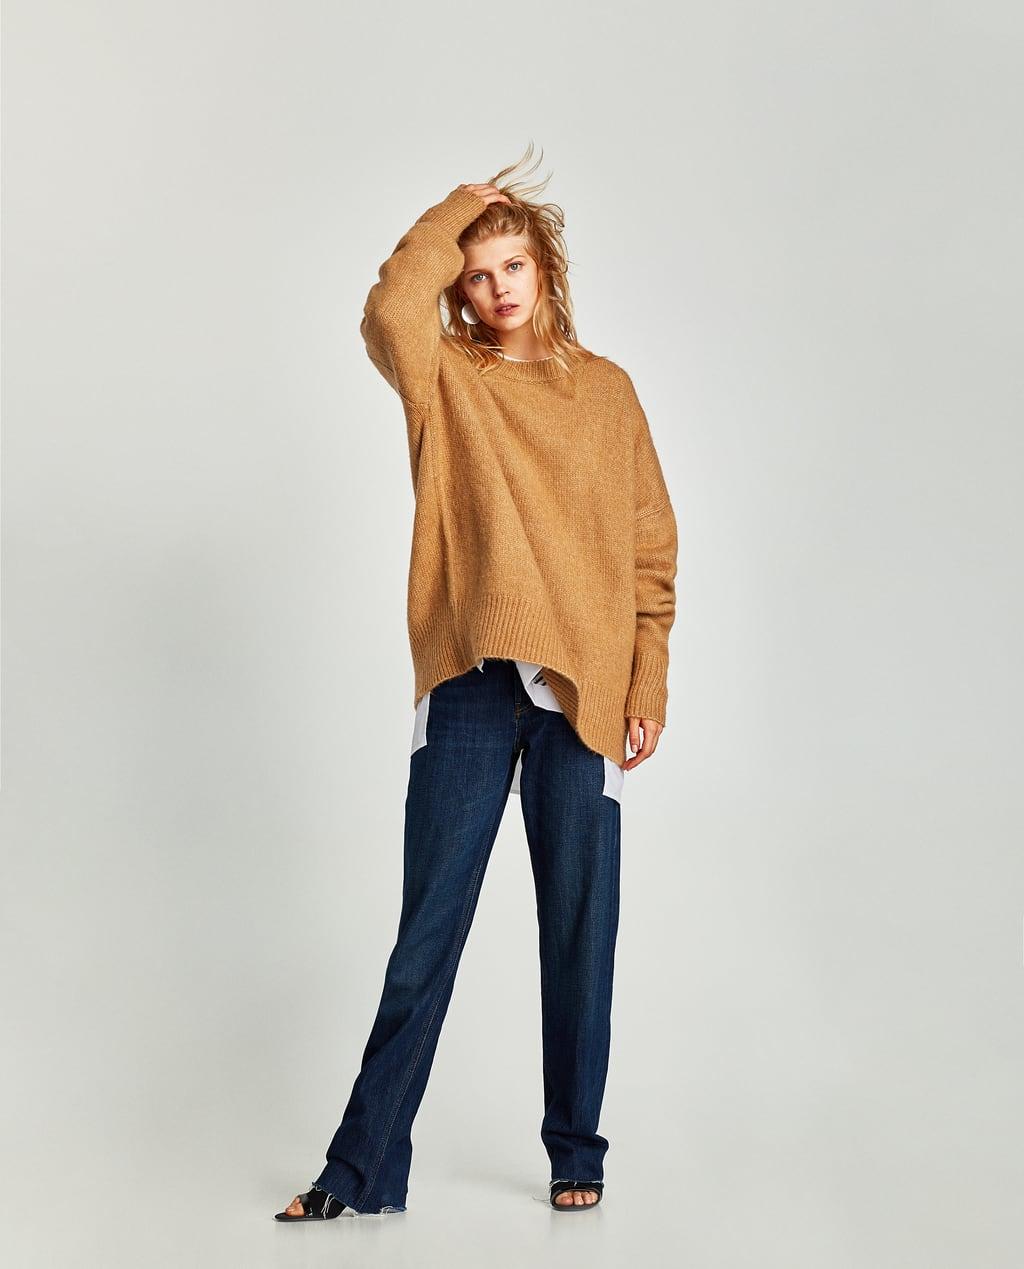 OVERSIZED SWEATER - Sweaters-KNITWEAR-WOMAN-SALE | ZARA United States